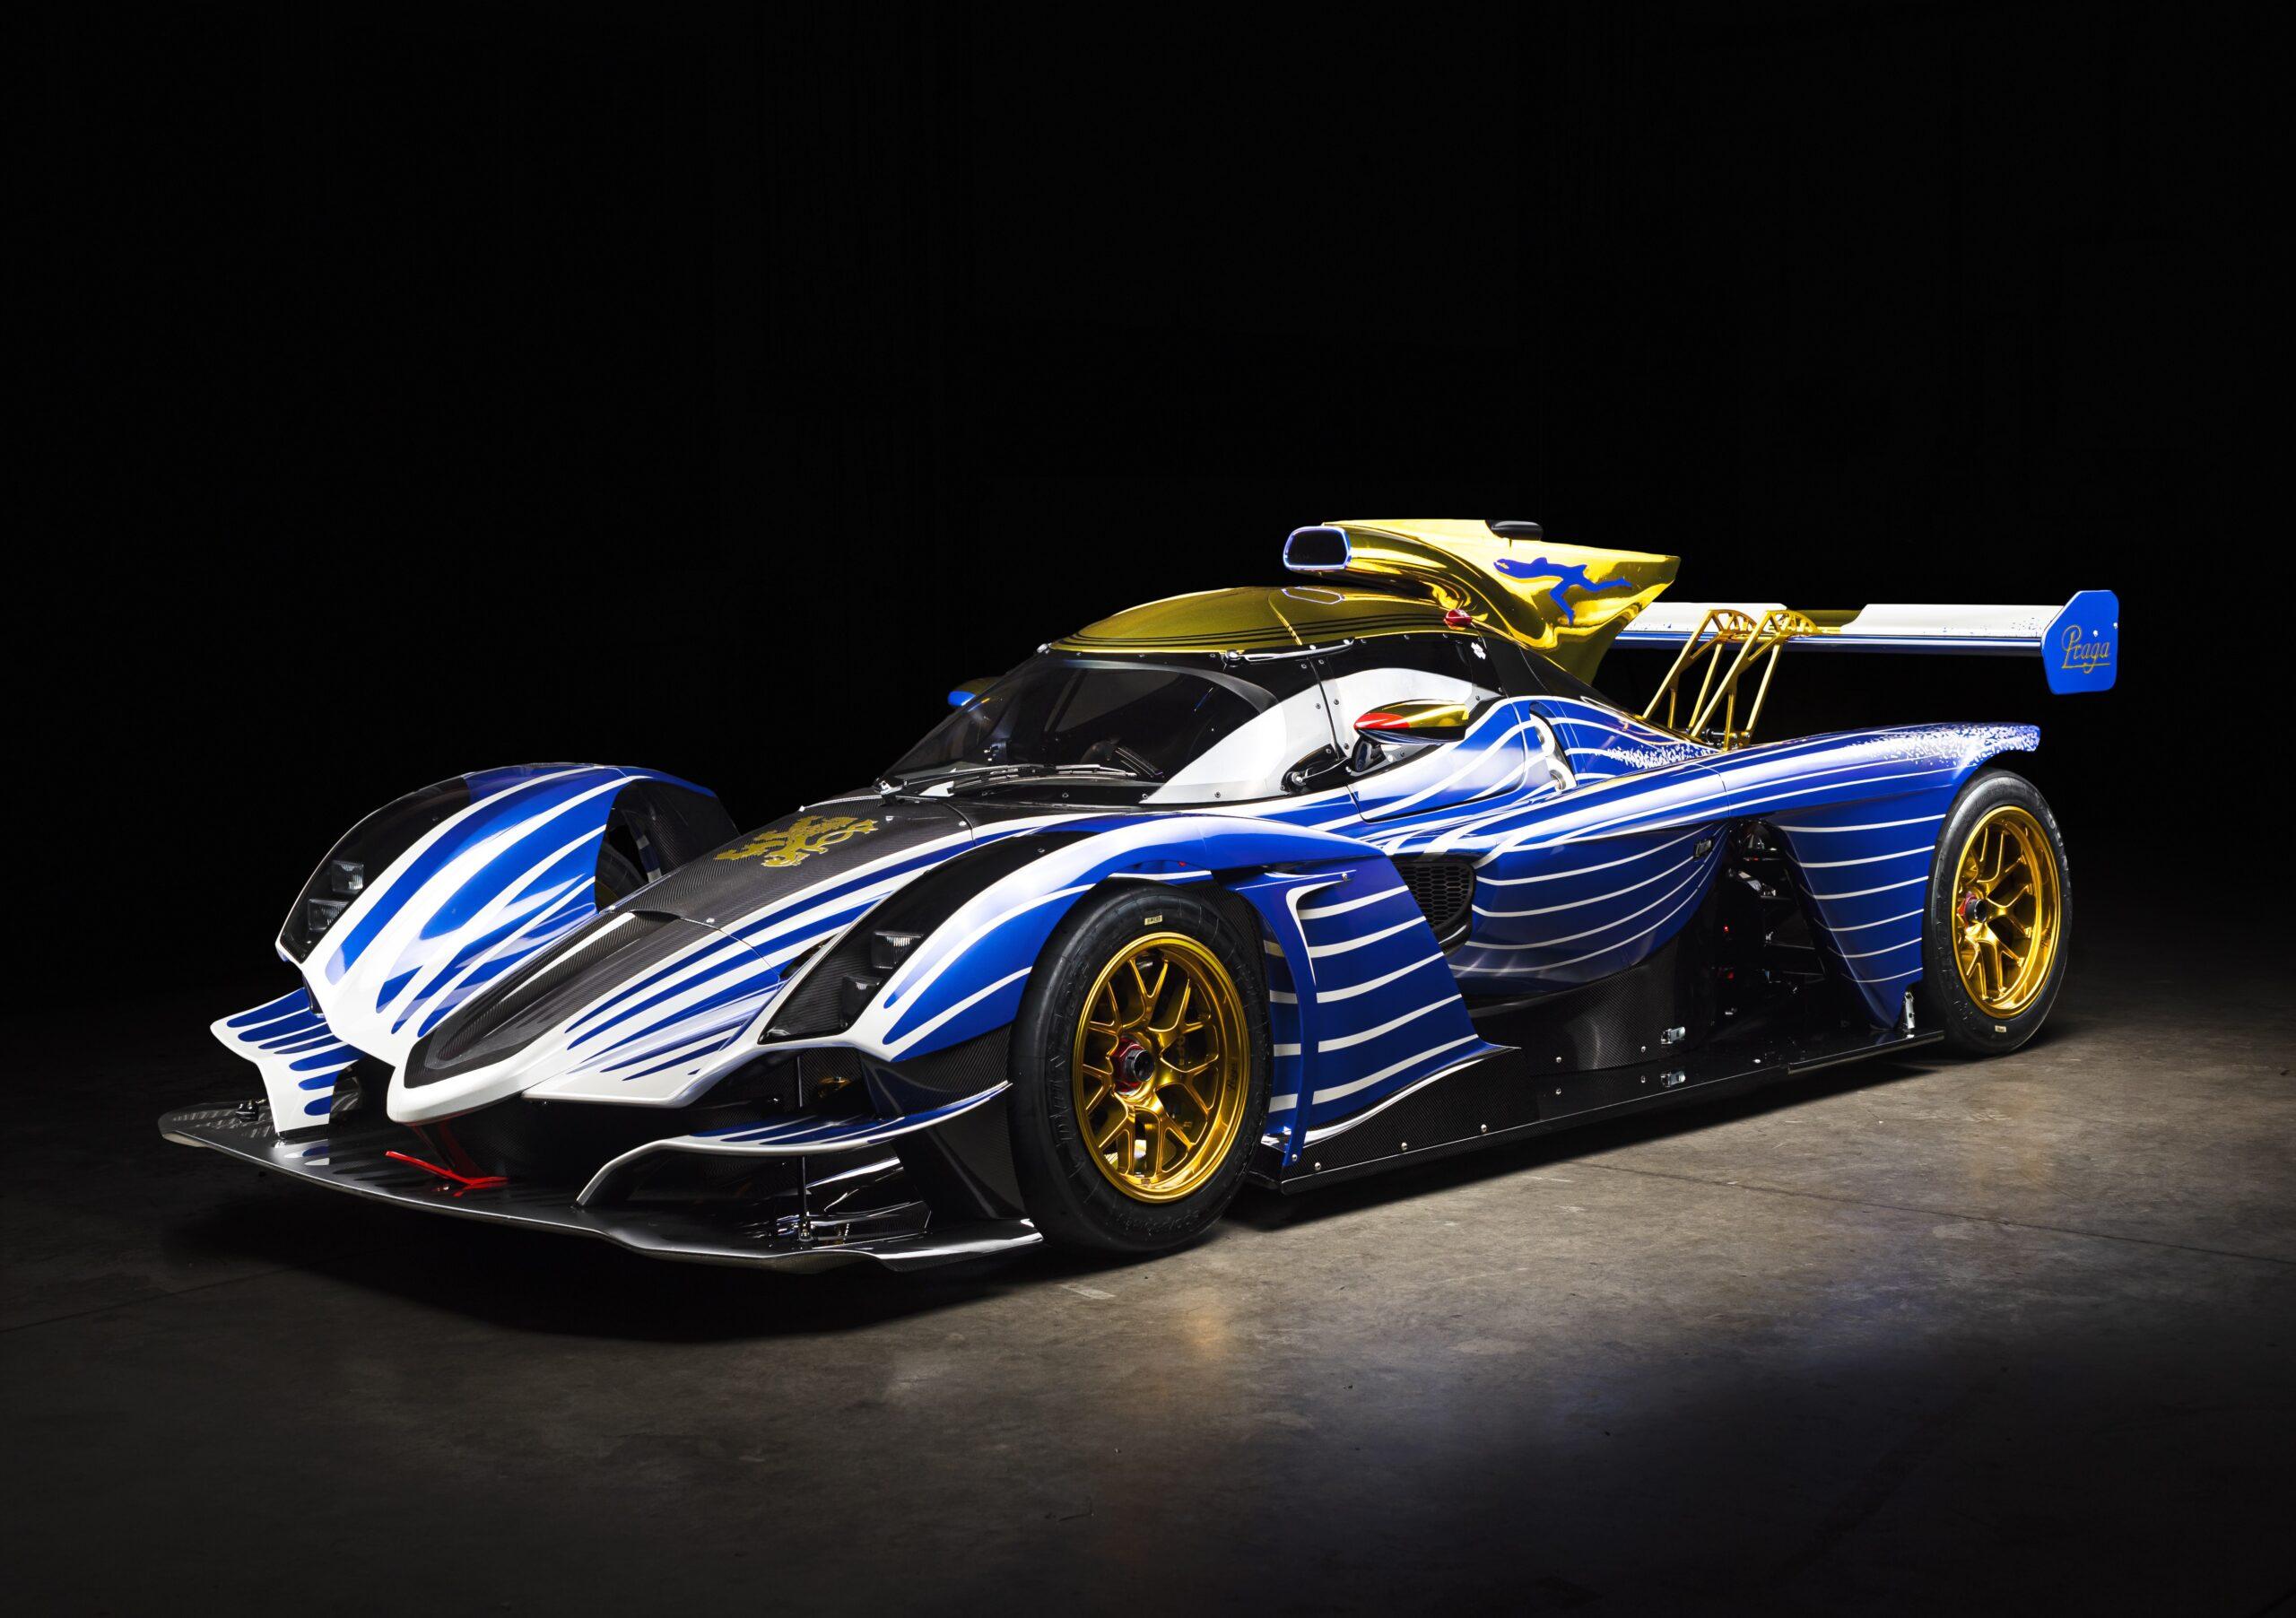 FRANK STEPHENSON DESIGN AND PRAGA CARS UNVEIL BESPOKE R1 RACING LIVERY